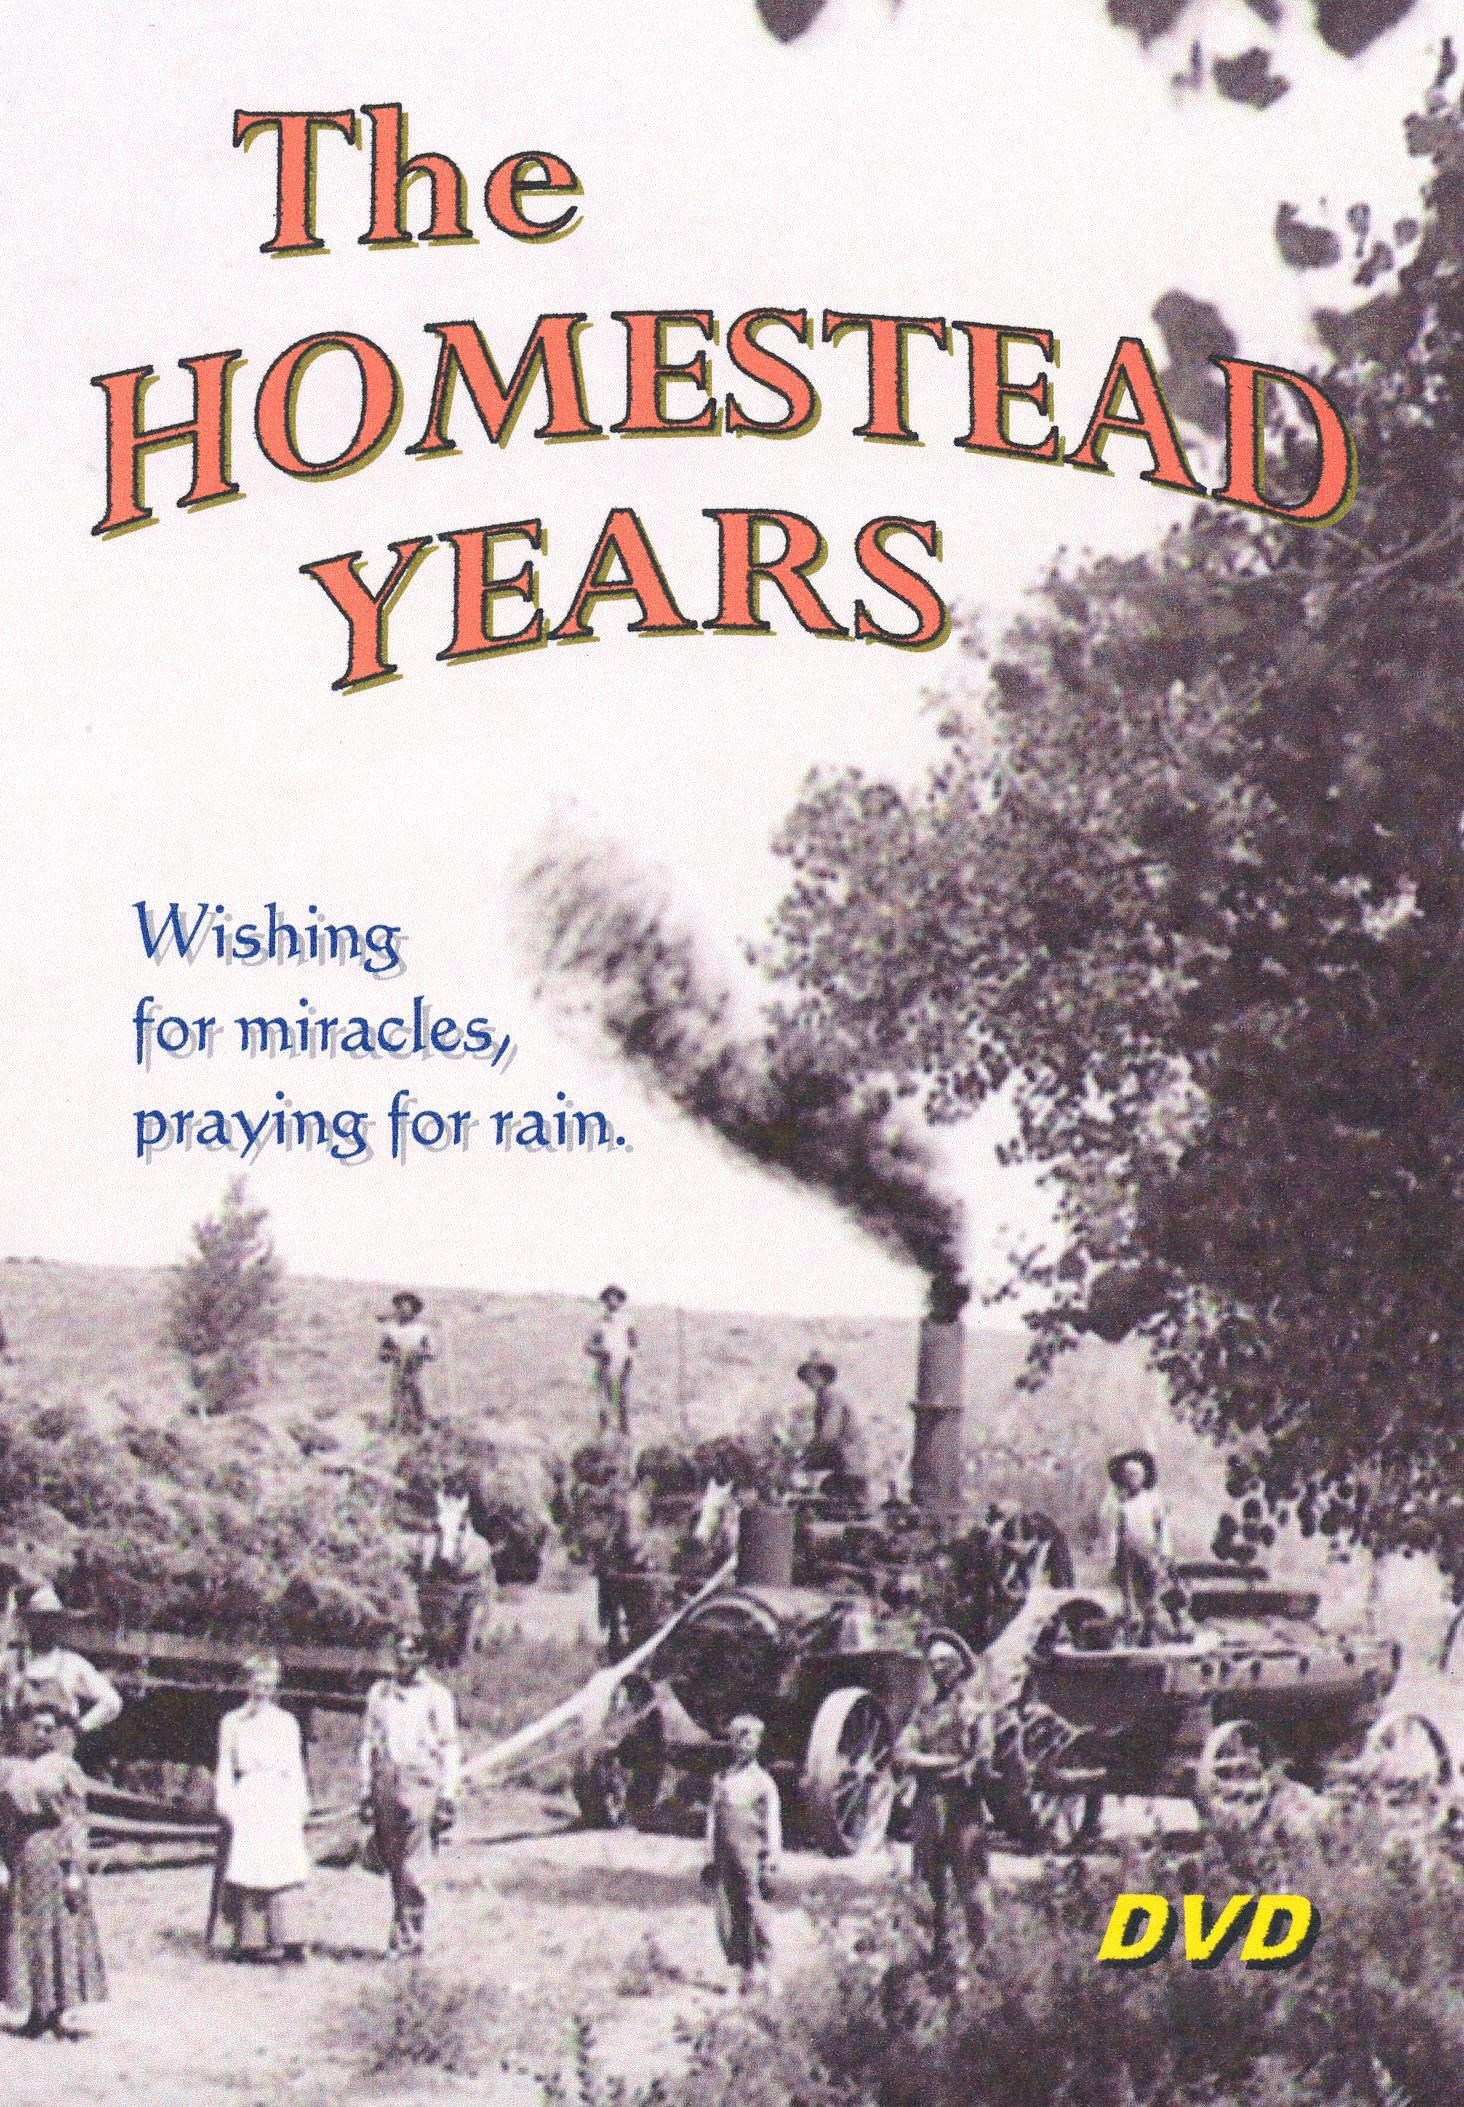 The Homestead Years